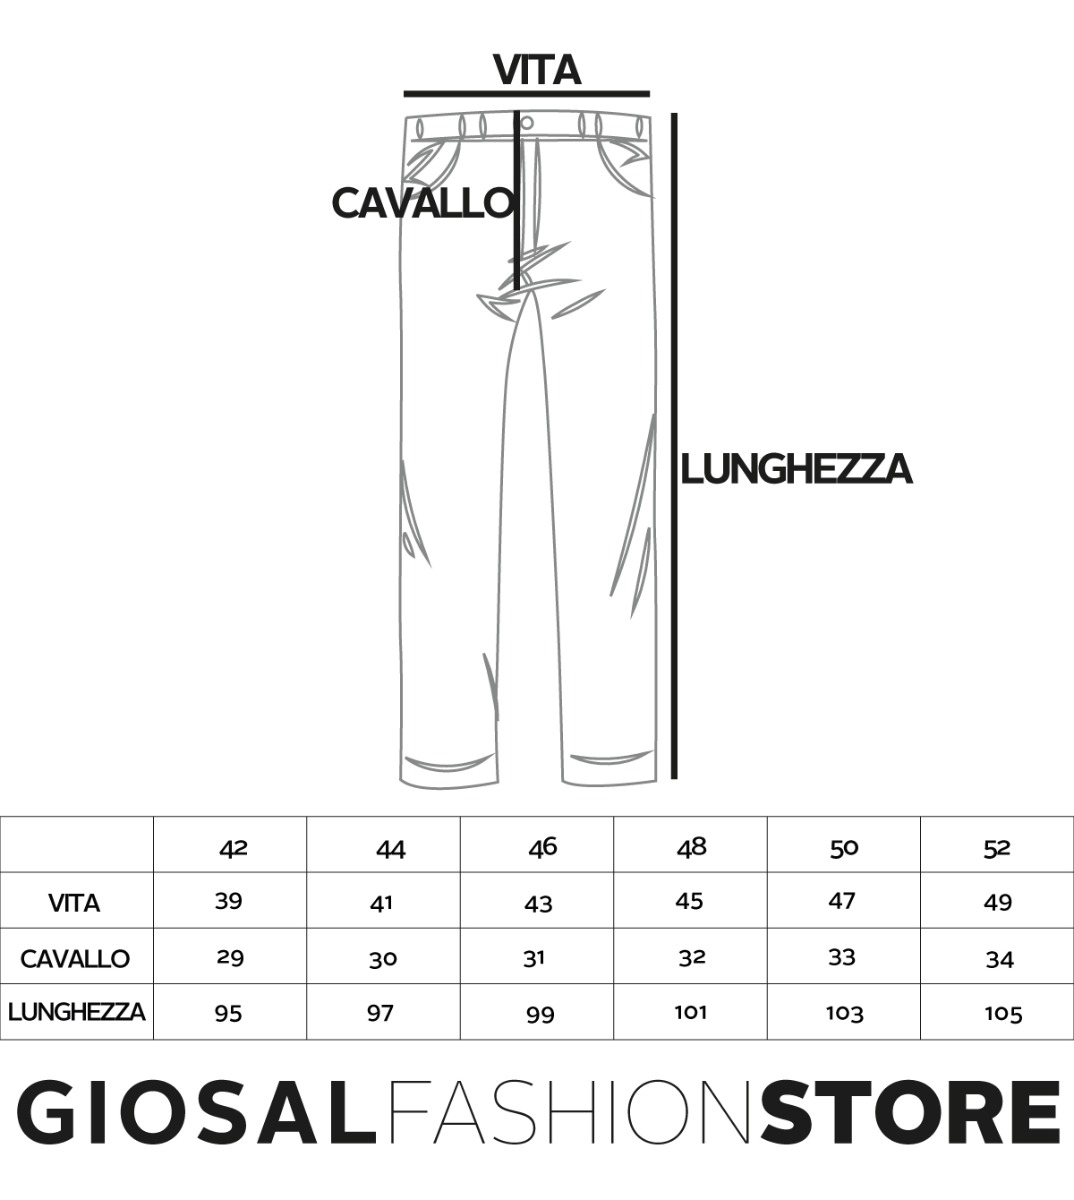 Pantalone-Uomo-Tasca-America-Mattone-Cavallo-Basso-Casual-Pence-GIOSAL miniatura 8